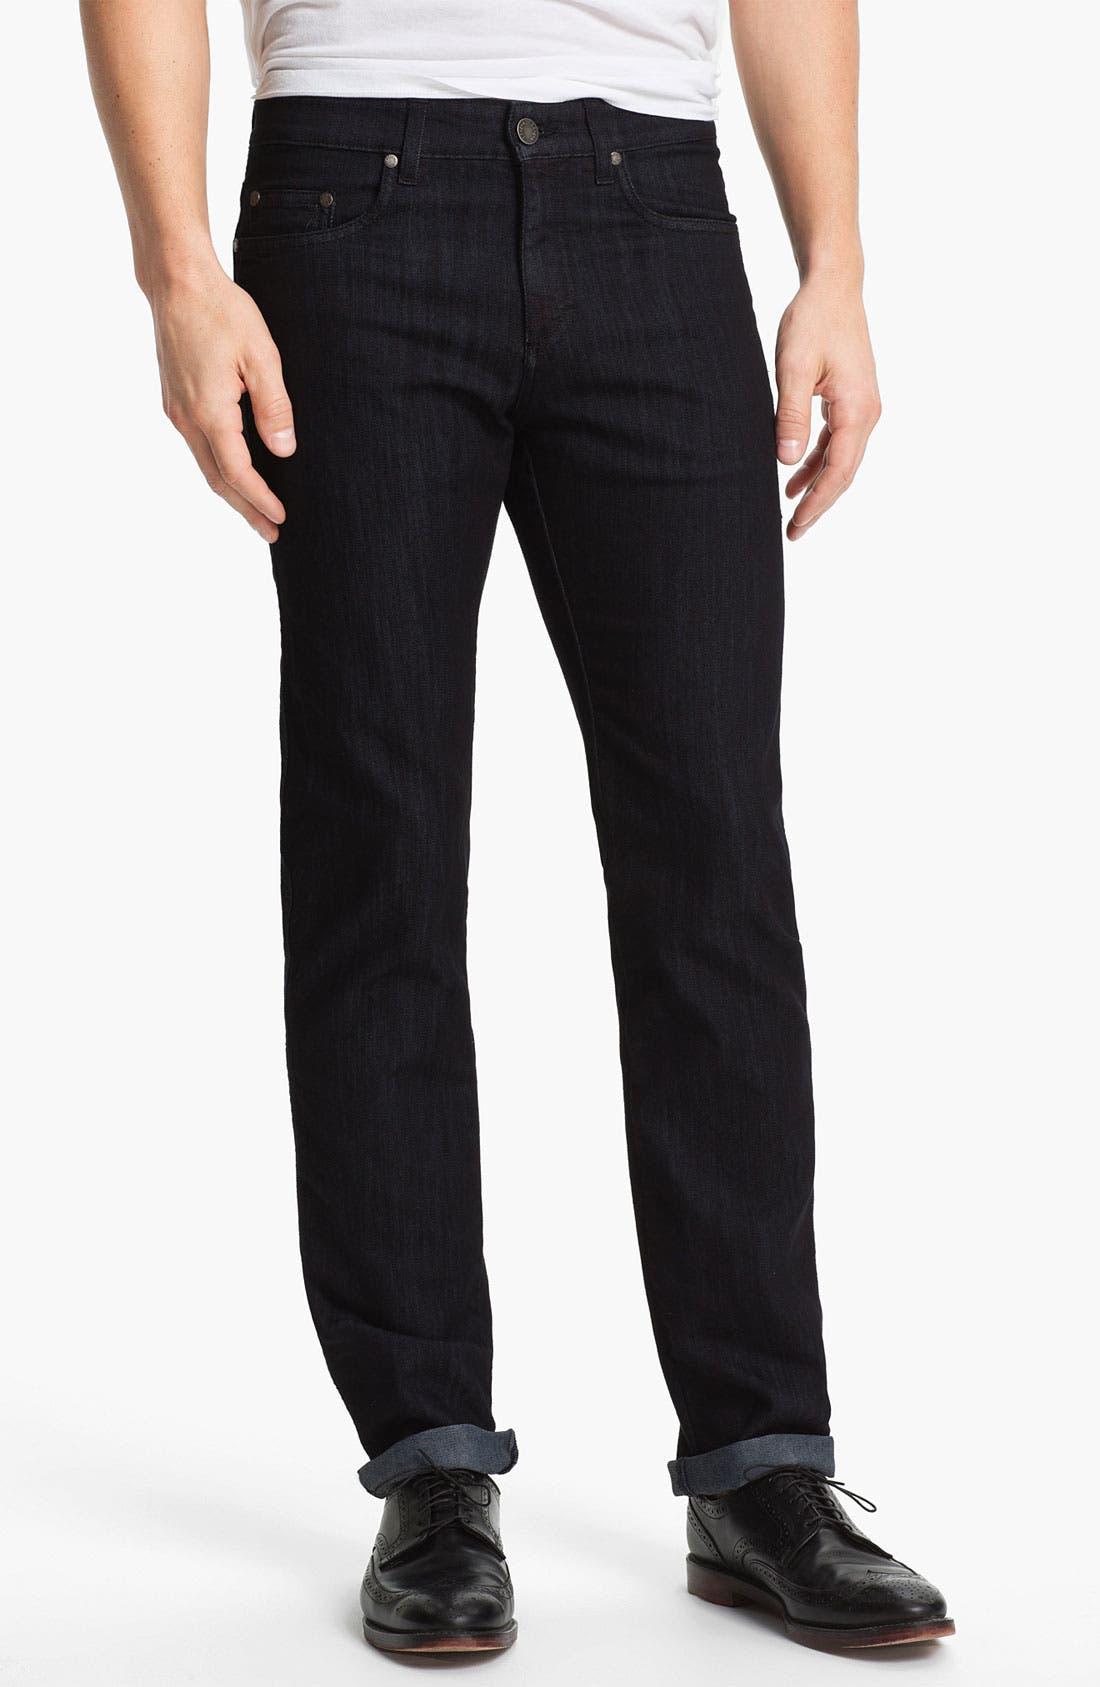 Alternate Image 1 Selected - Z Zegna 'Metalized Effect' Straight Leg Jeans (Black)